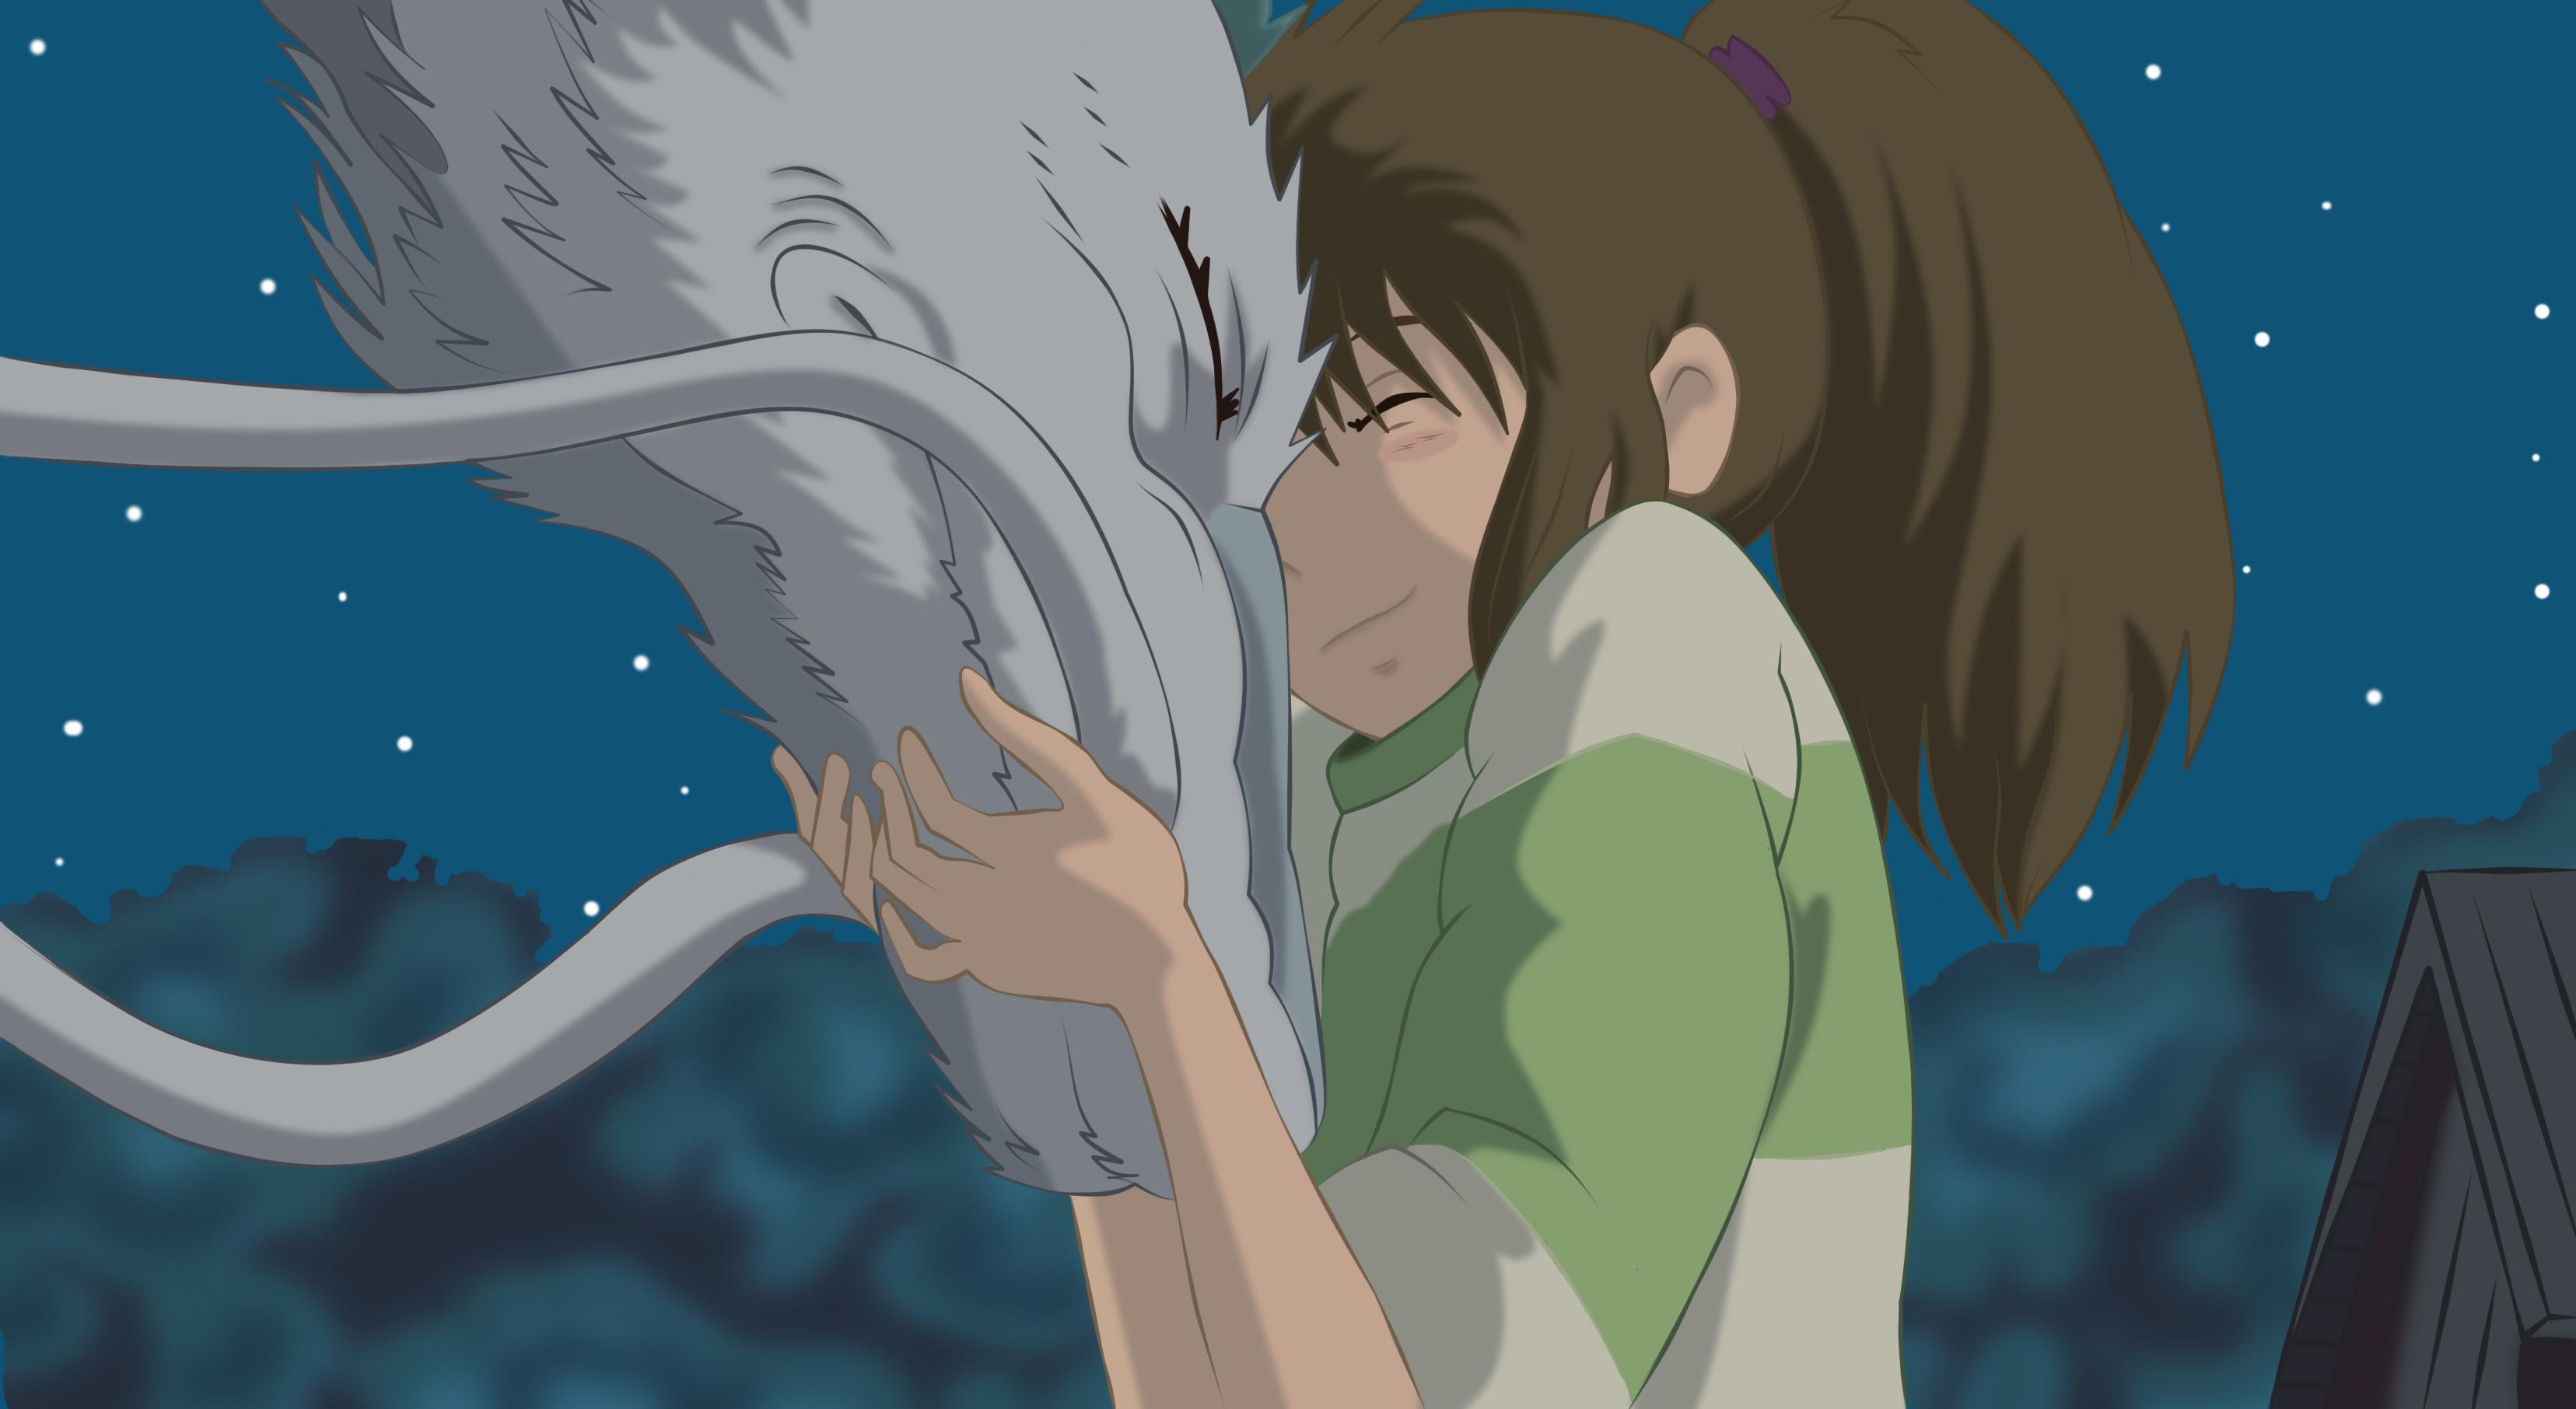 Chihiro and Haku || Spirited Away~ by kenjakiddy on DeviantArt